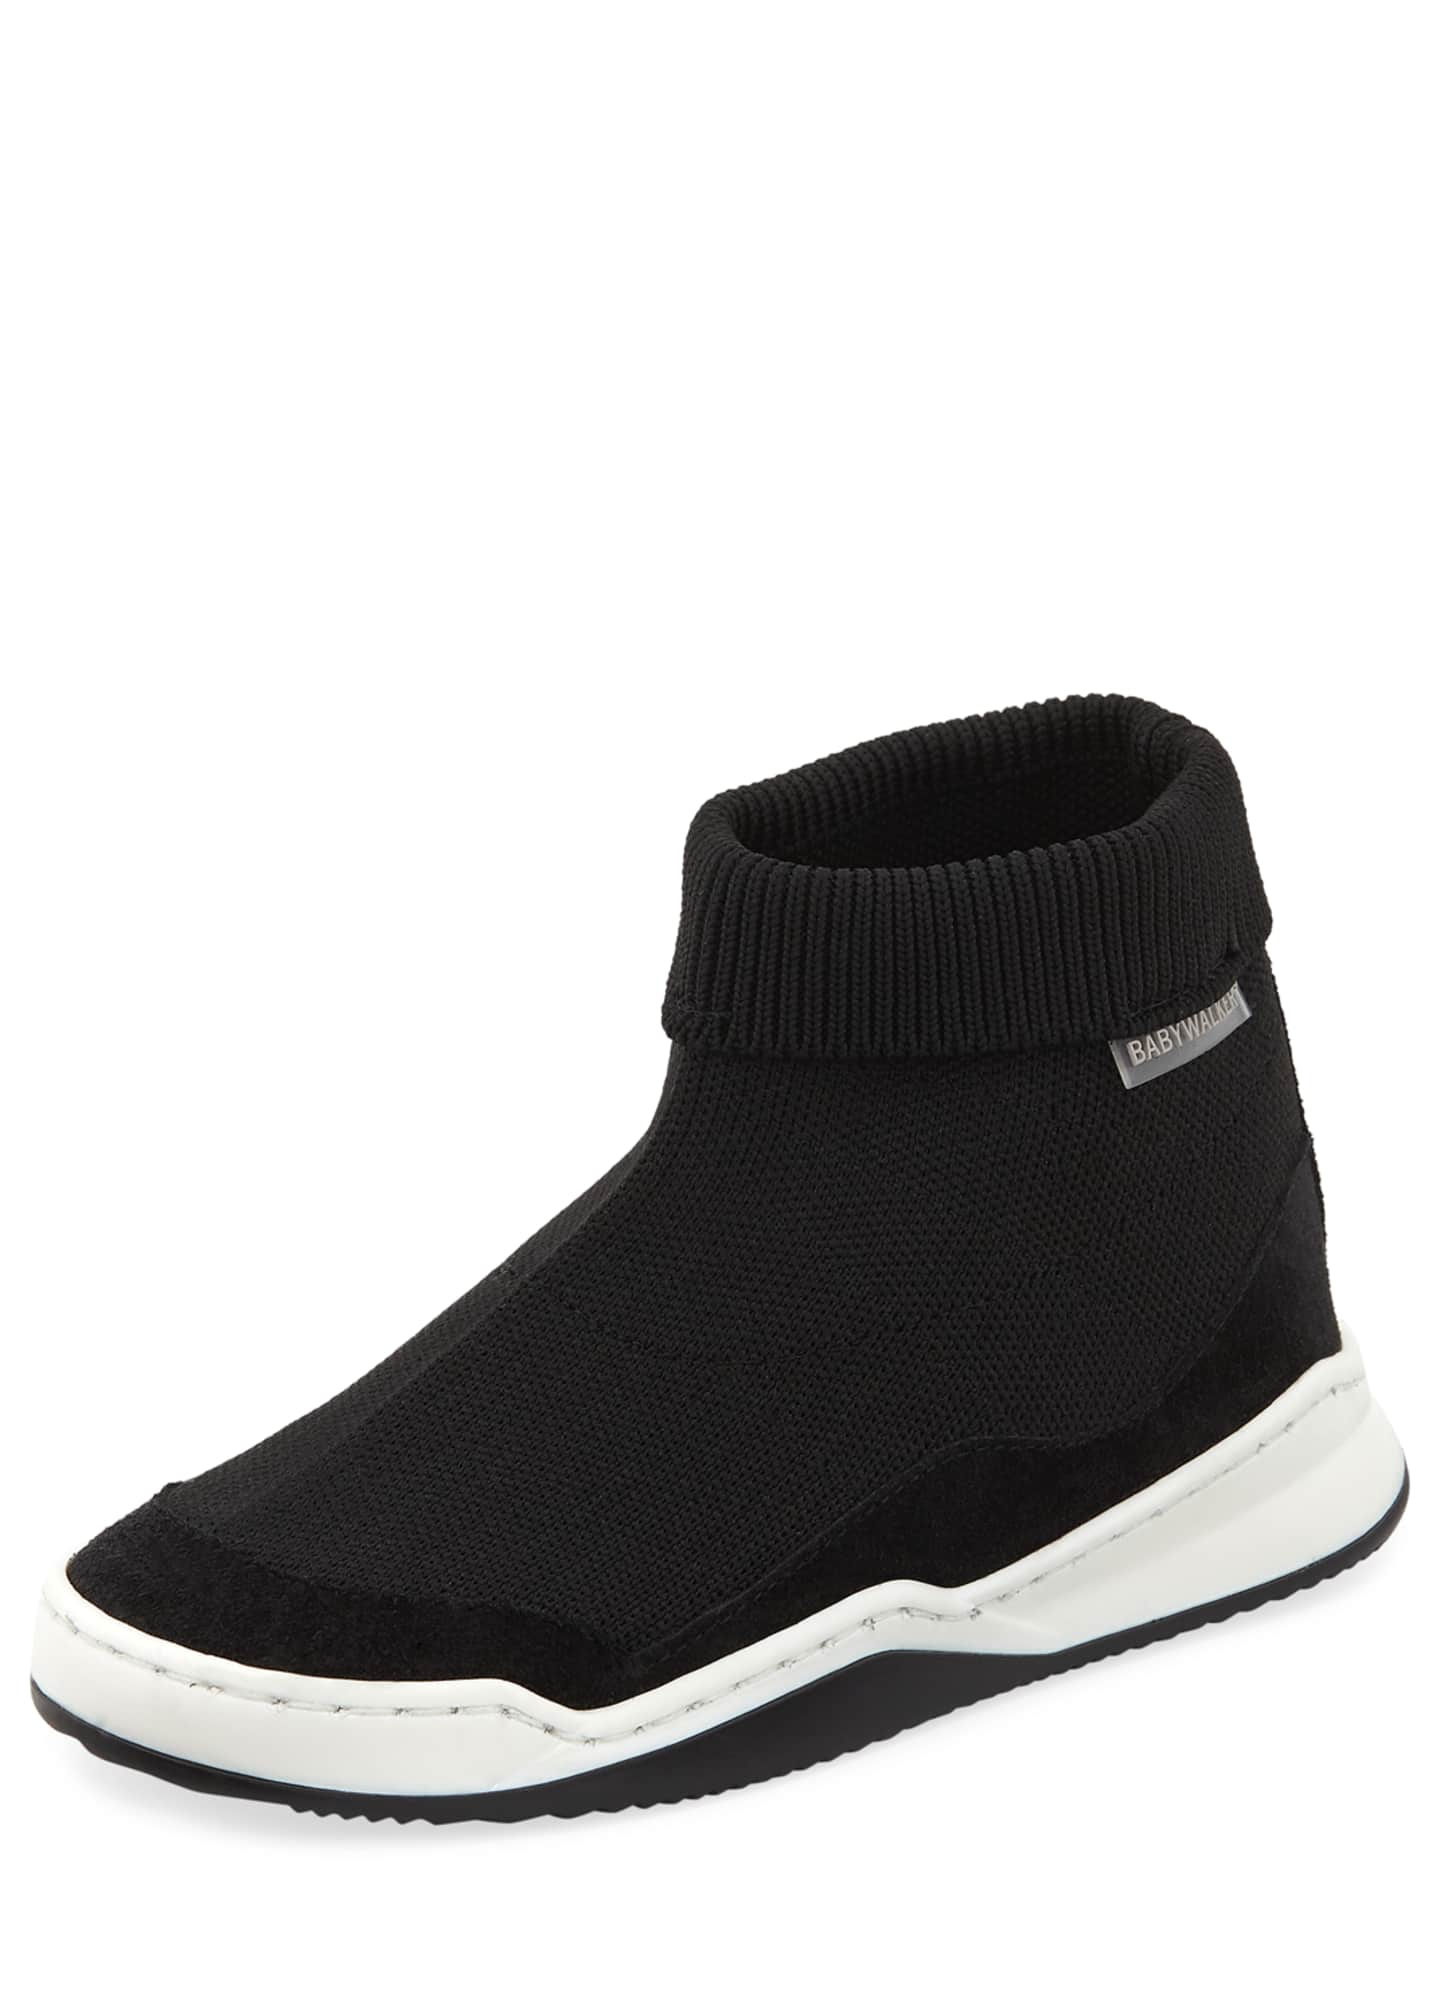 Babywalker Suede-Trim Sock Sneaker, Toddler